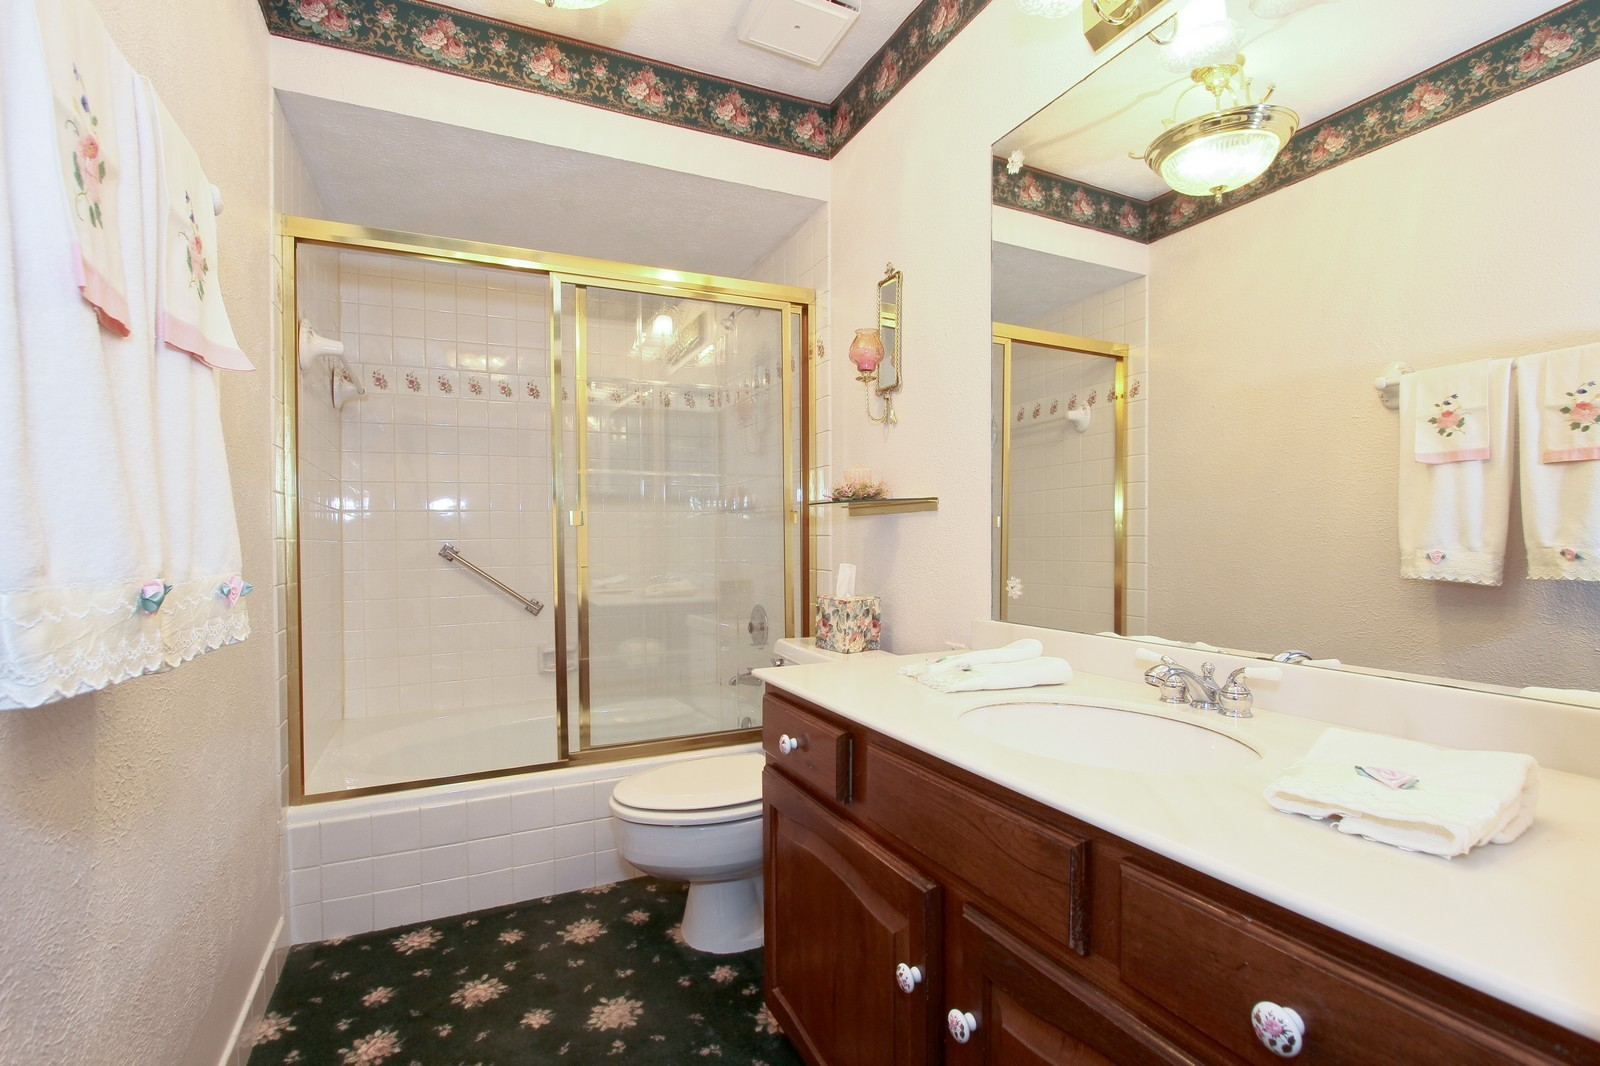 Real Estate Photography - 7713 Golf, Unit 2B, Palos Heights, IL, 60463 - Bathroom